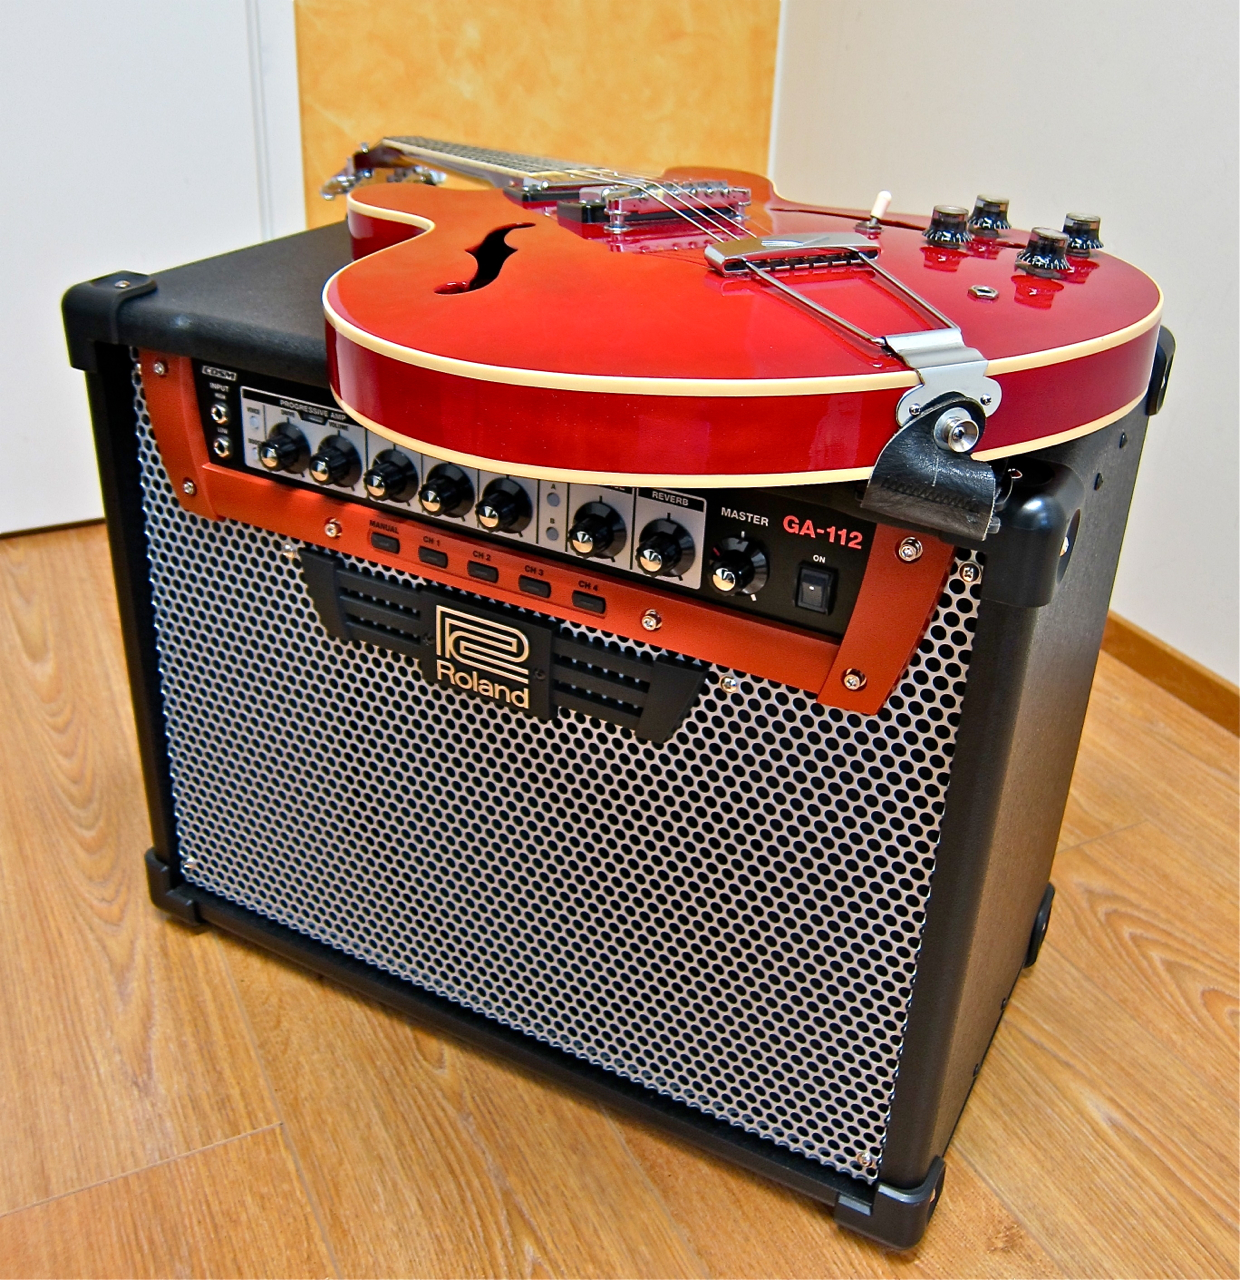 guitar combos gear review finland. Black Bedroom Furniture Sets. Home Design Ideas